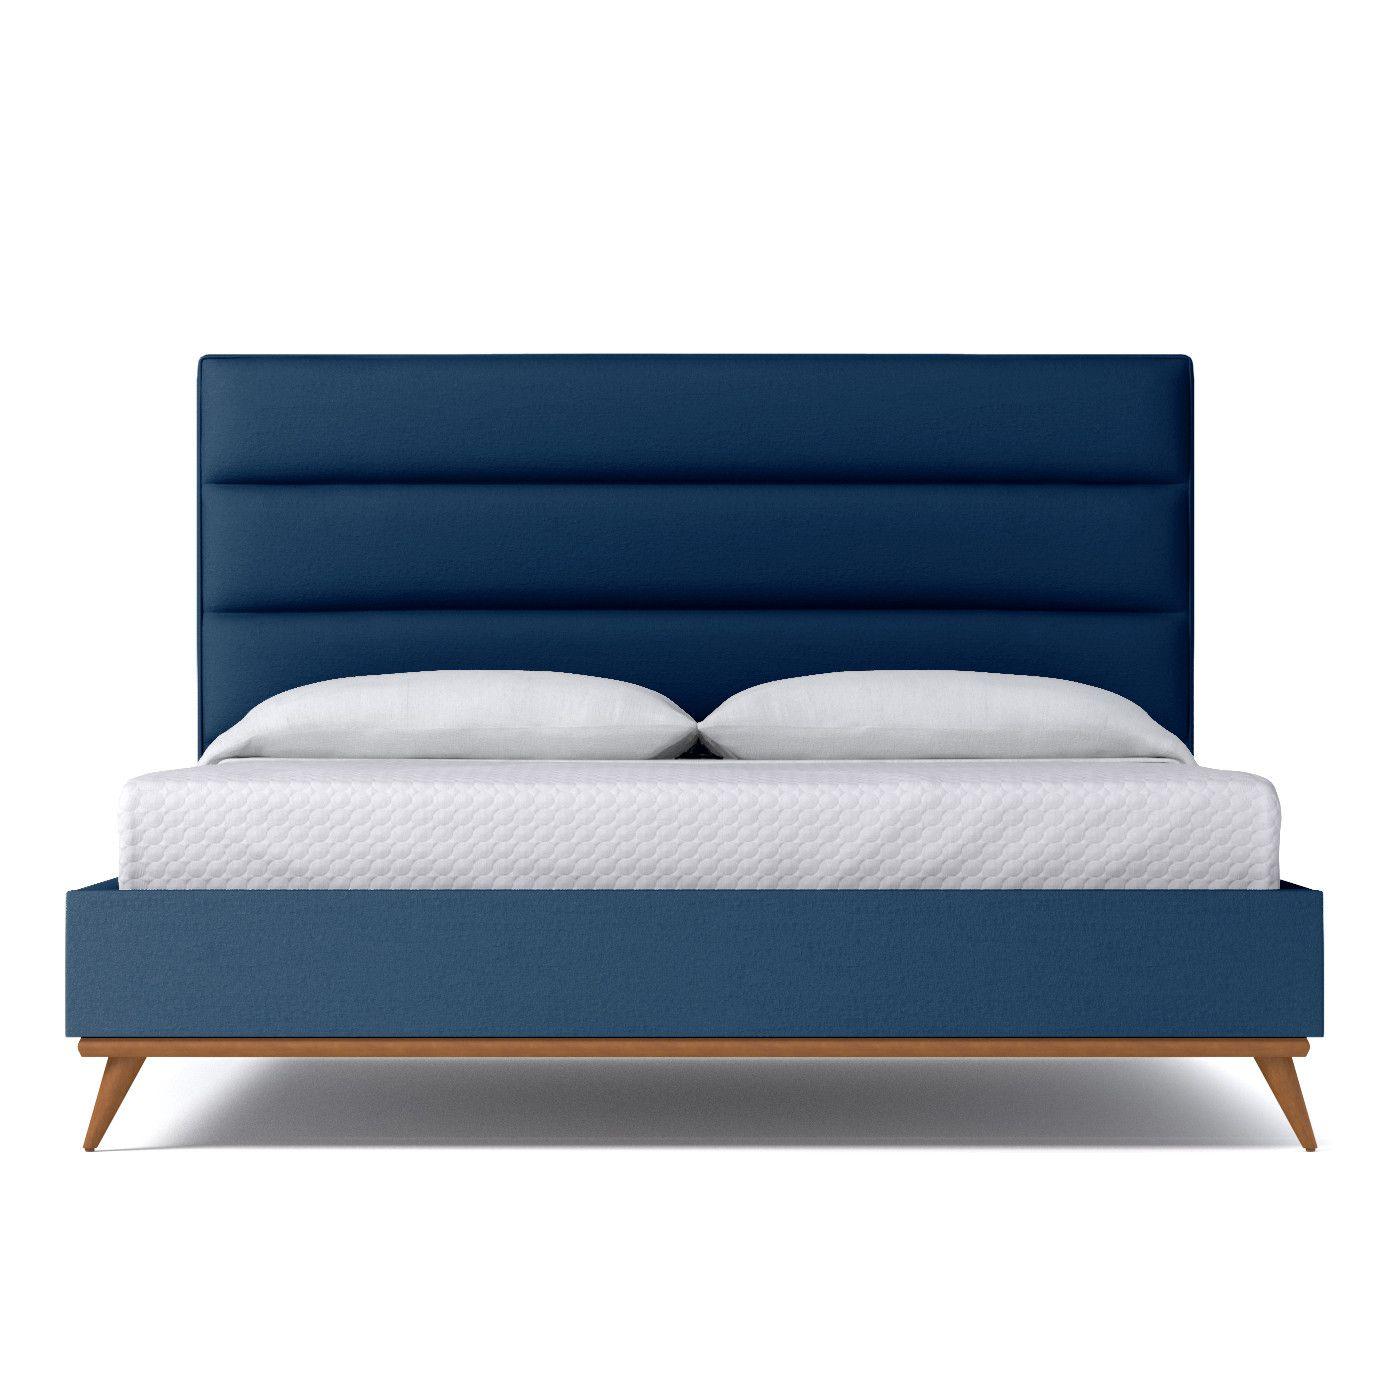 Cooper Upholstered Bed | Pinterest | Camas tapizadas, Cabecera y ...